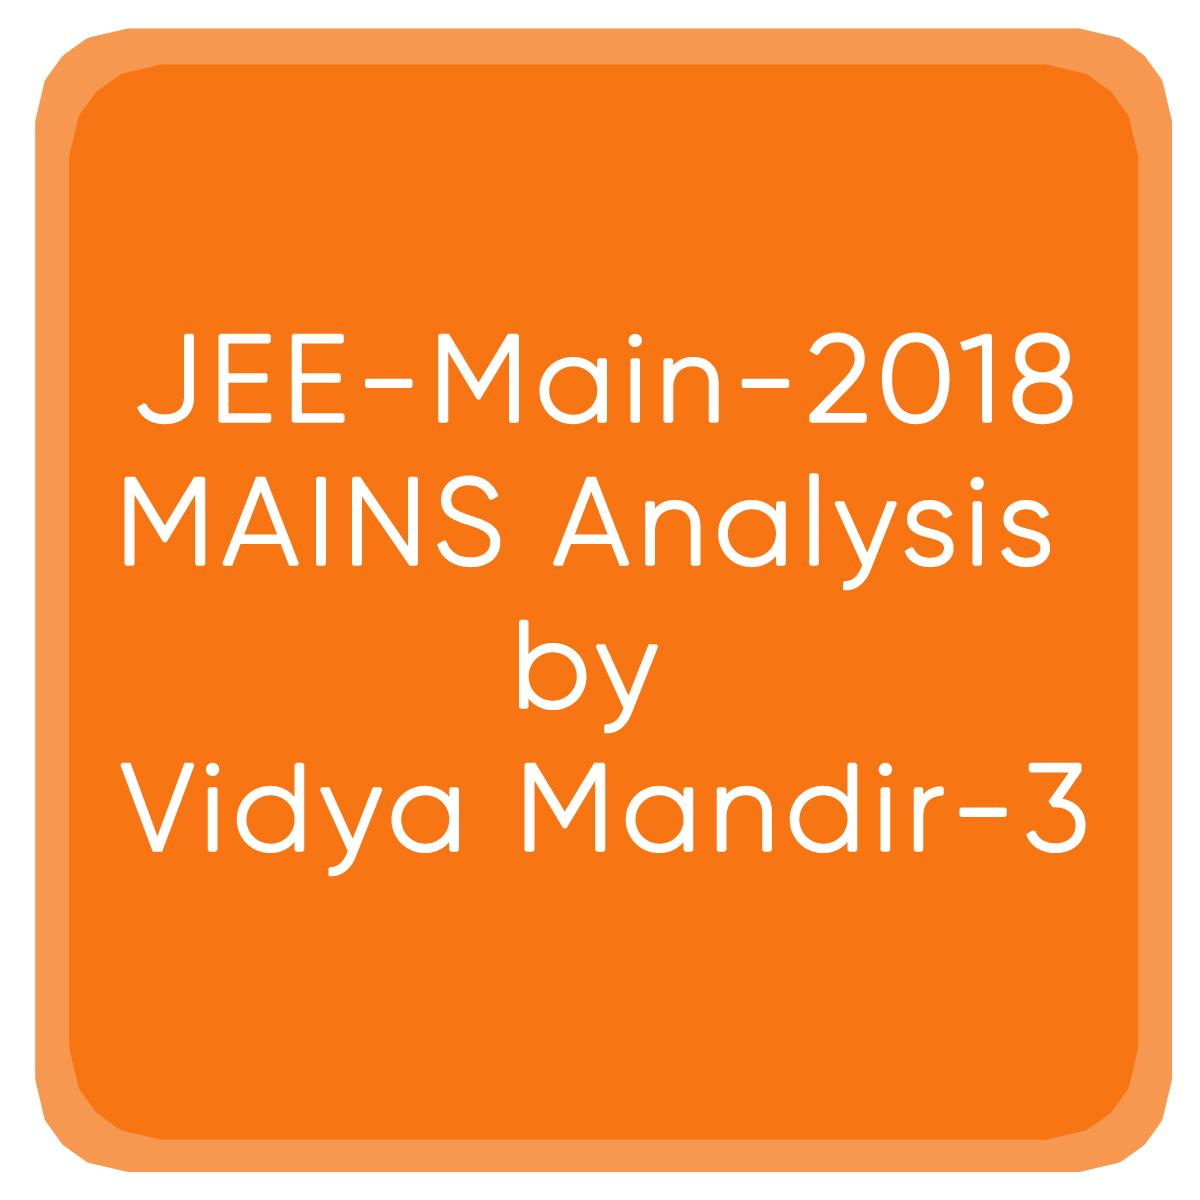 JEE-Main-2018-MAINS Analysis by Vidya Mandir-3